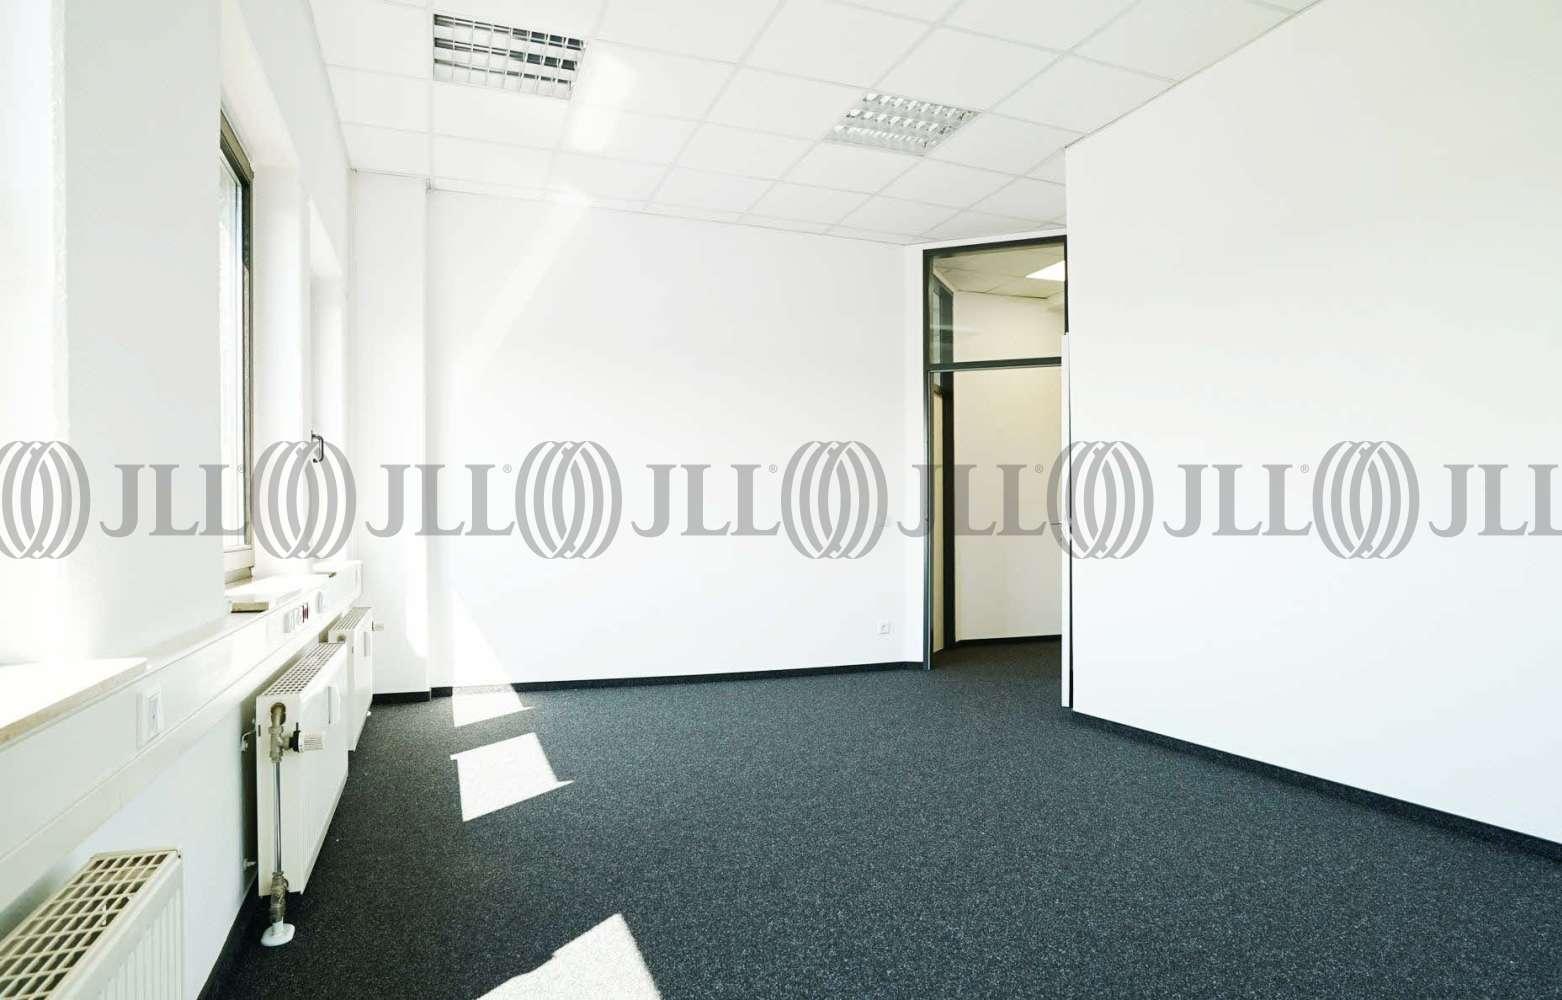 Büros Krefeld, 47807 - Büro - Krefeld, Fischeln - D1501 - 10816784